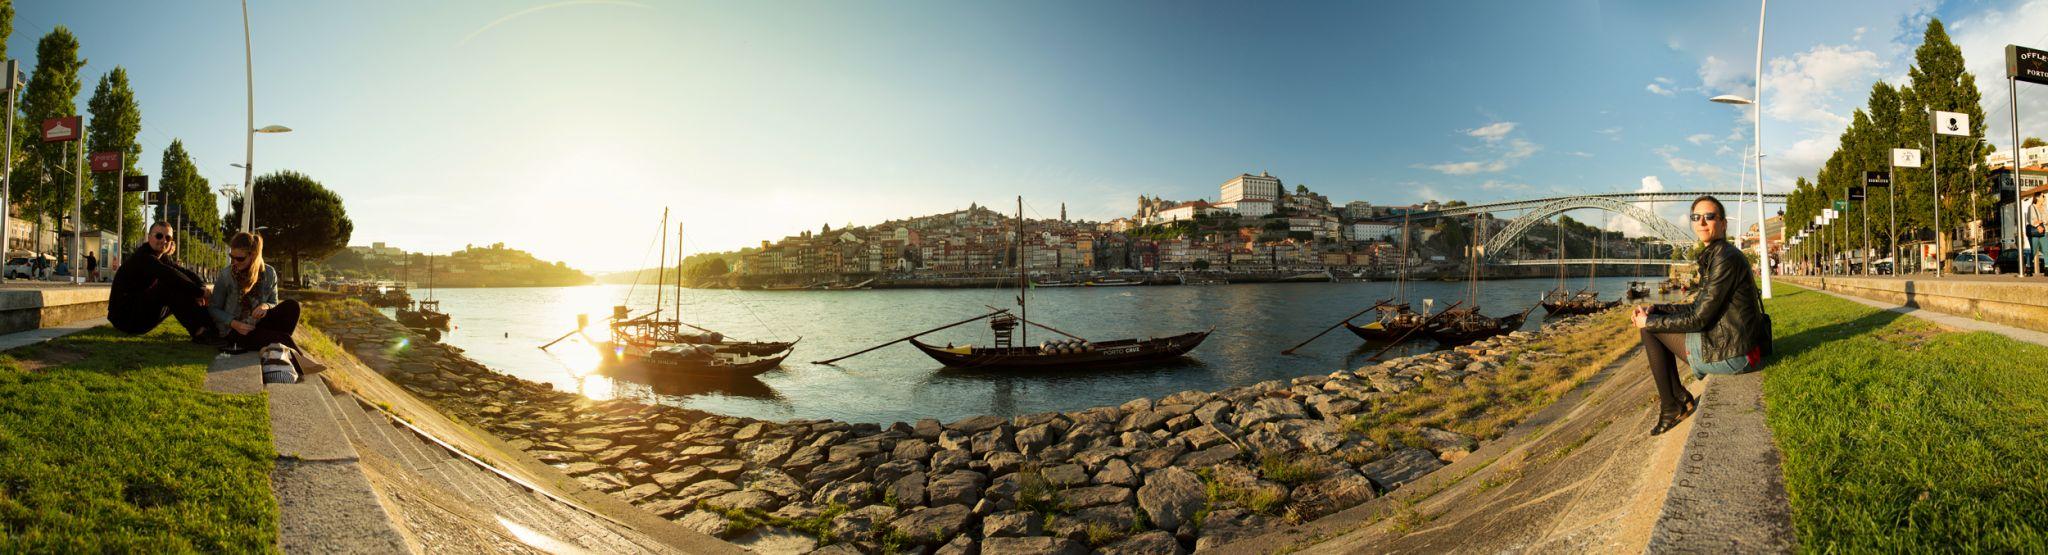 Sandeman´s corner, Portugal